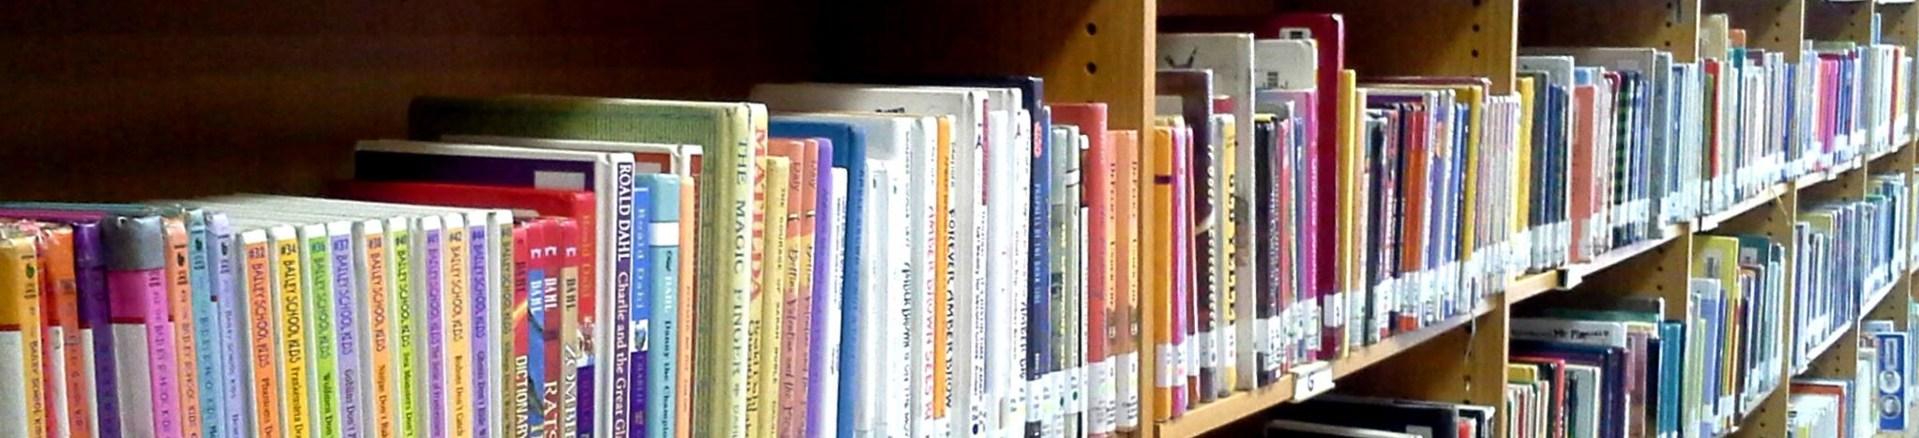 Elementary stacks